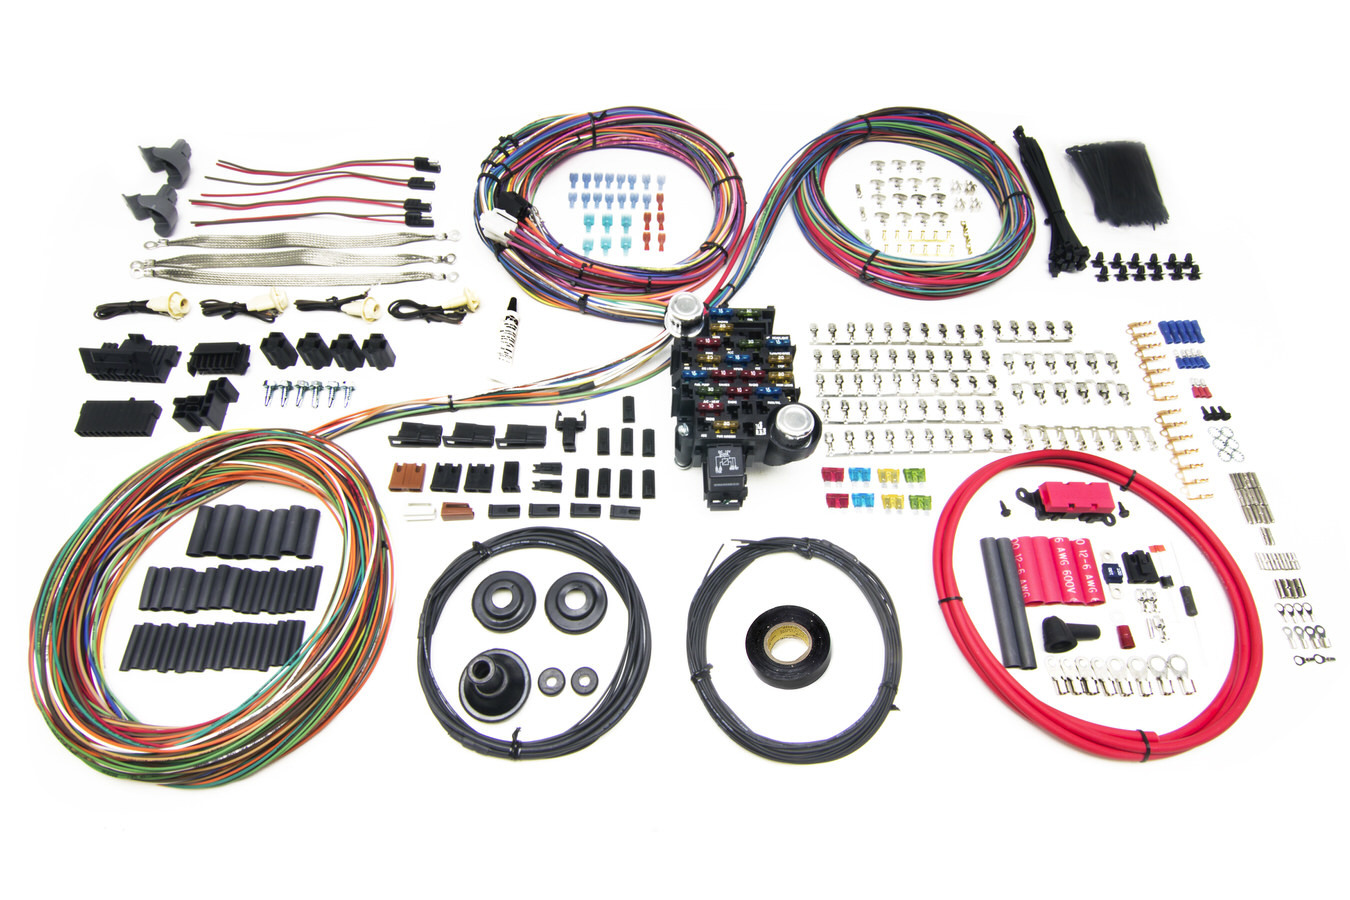 Painless Wiring 25 Circuit Harness - Pro Series GM Keyed Colum